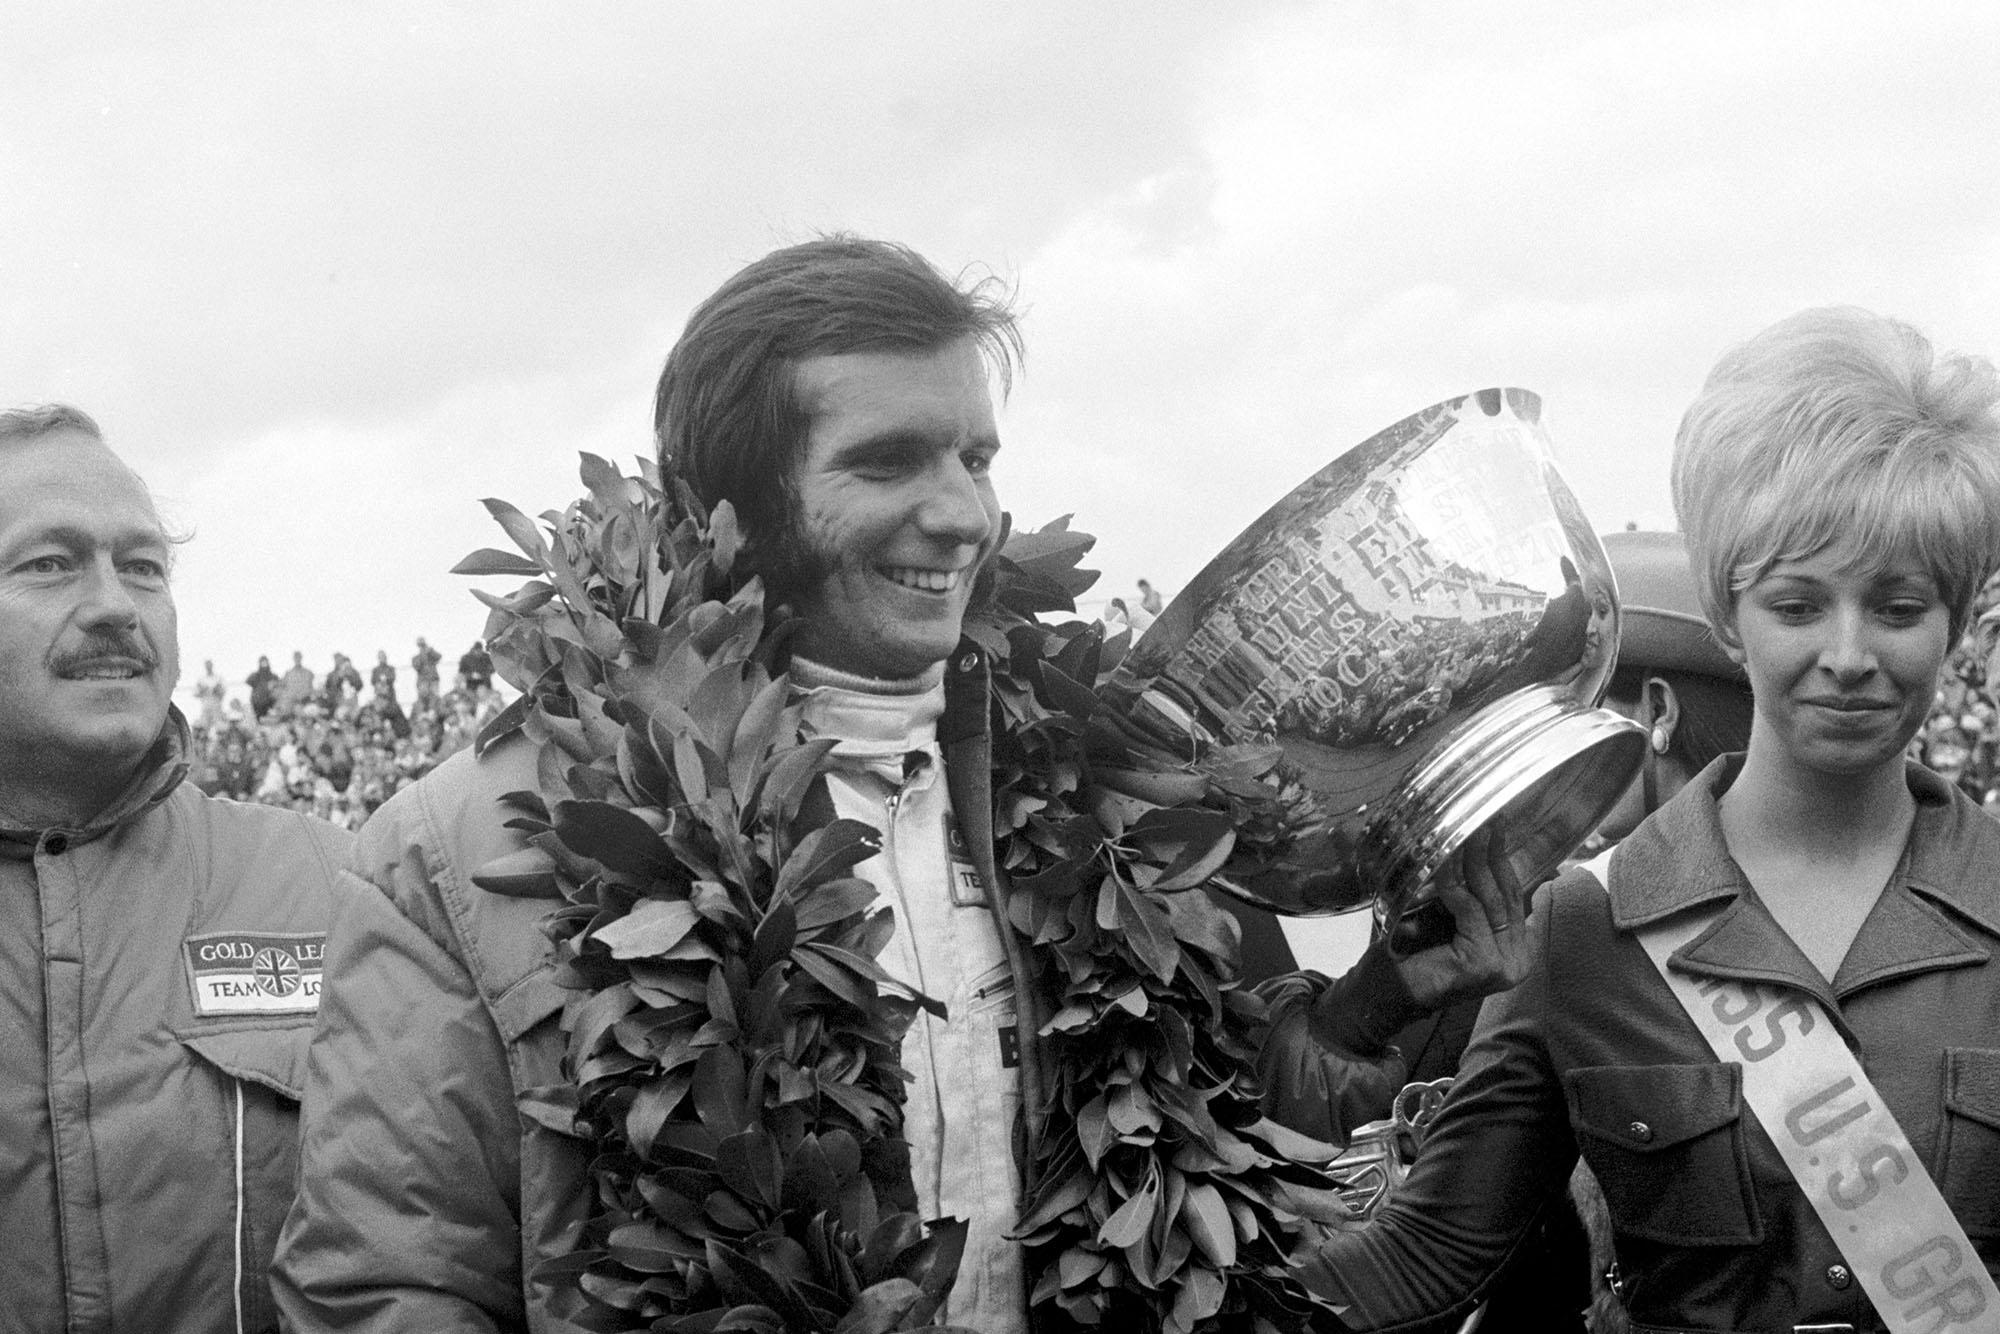 Emerson Fittipaldi celebrates on the podium after winning the 1970 United States Grand Prix